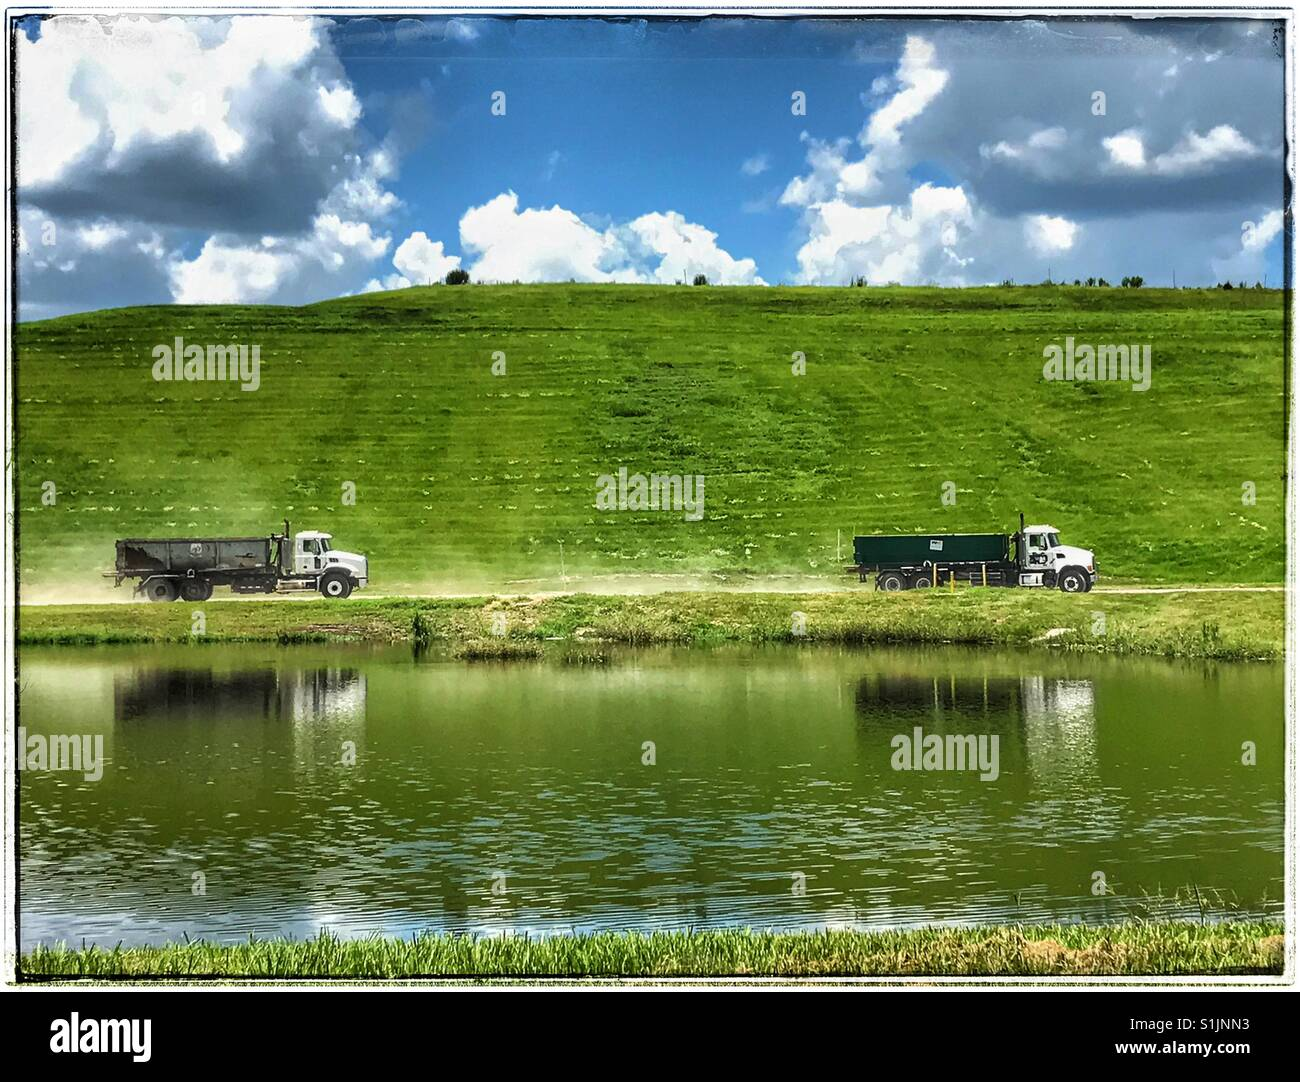 Idyllic sunny day at the land fill - Stock Image